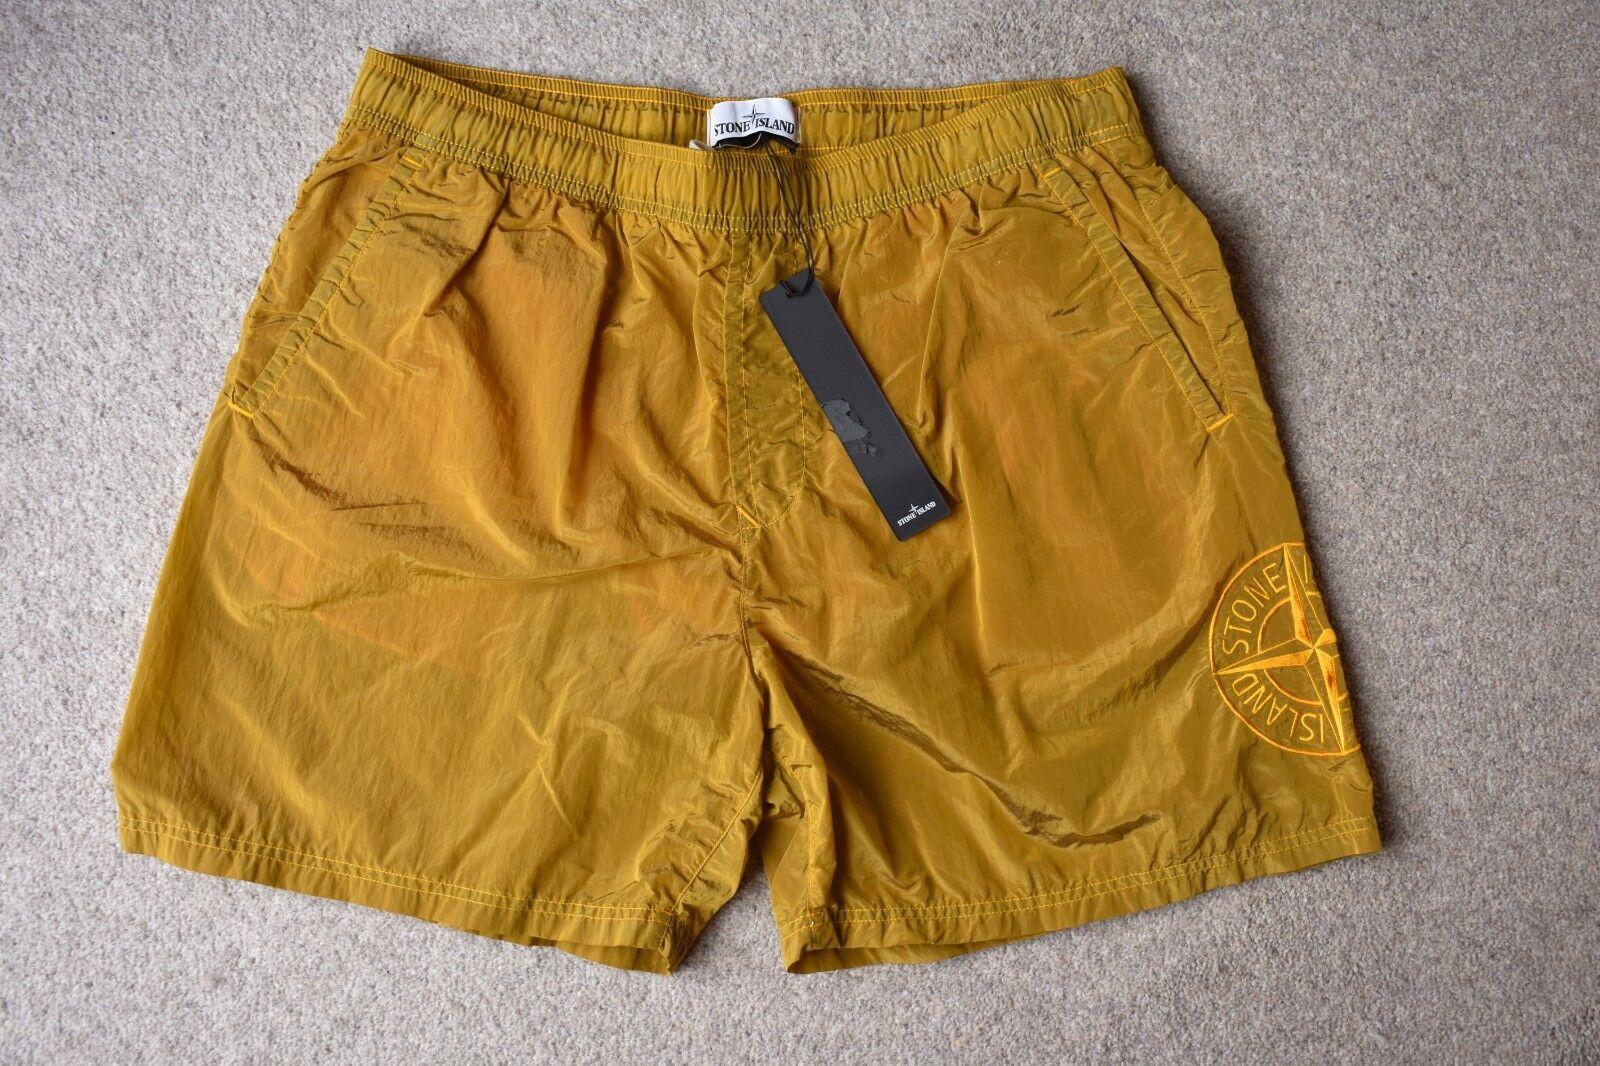 's Stone Island Bleu Marine Nylon Shorts Métal Swim/Casual Shorts Nylon SS18 XL BNWT (33) a2ebf9